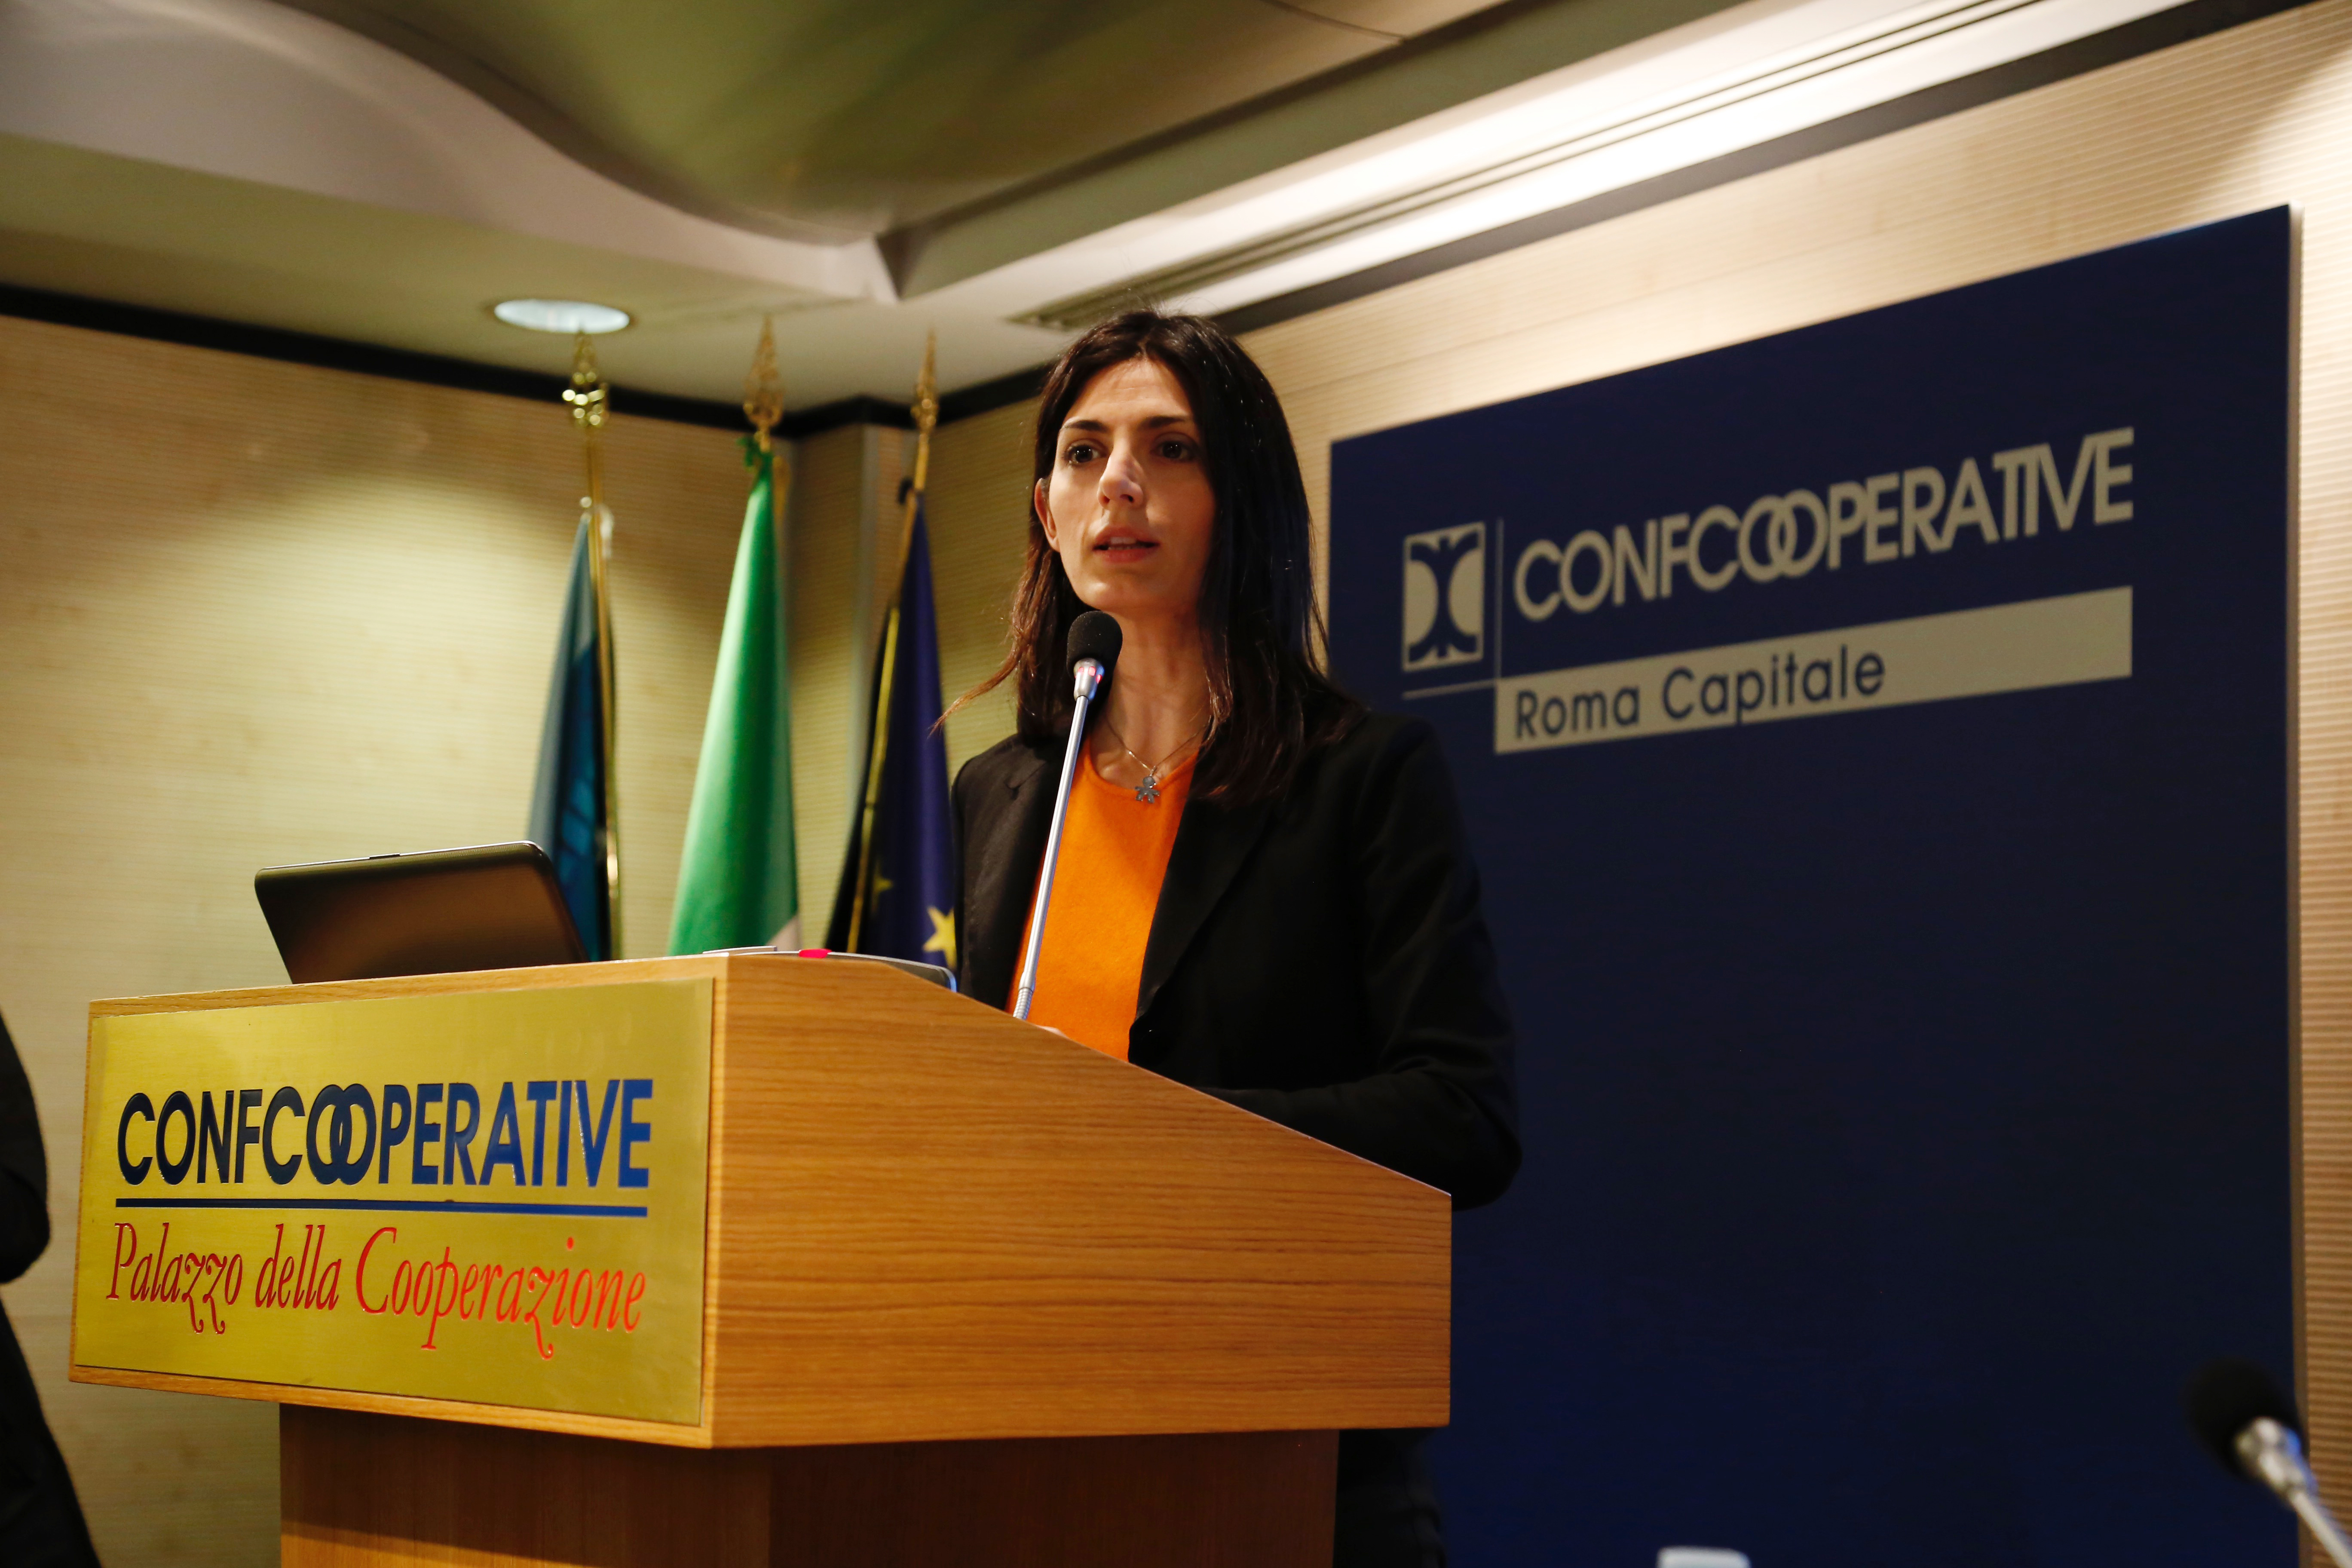 Virginia Raggi, discorso introduttivo (foto di Francesca Salvati)